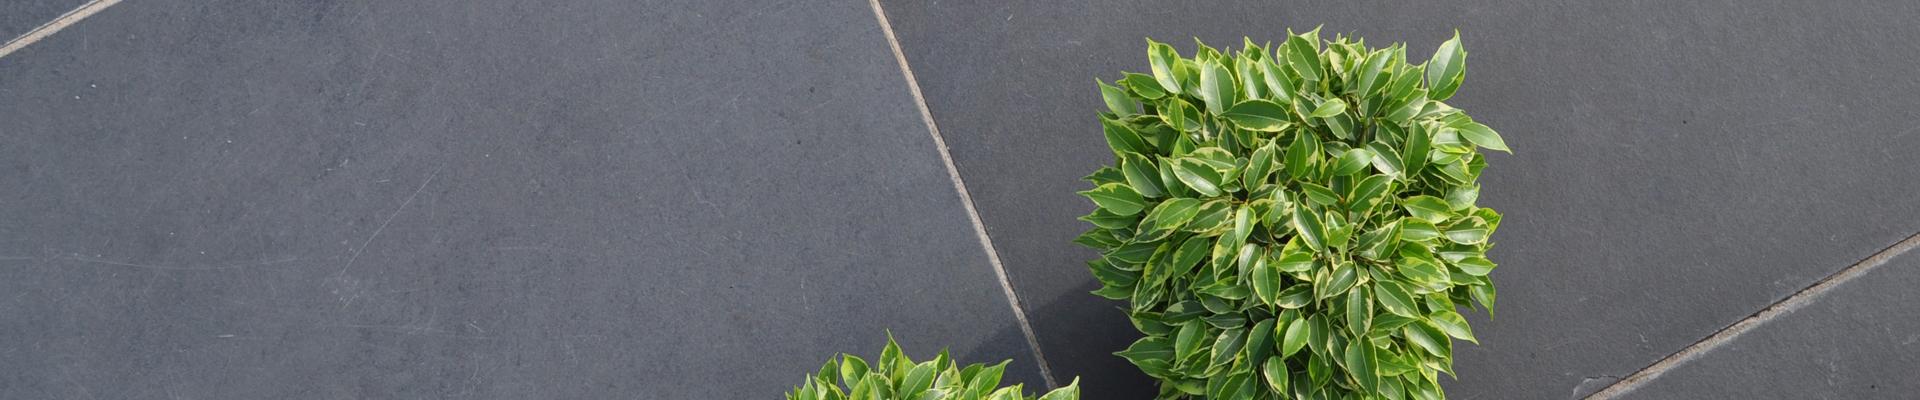 Bart Poppelaars Tuinmaterialen